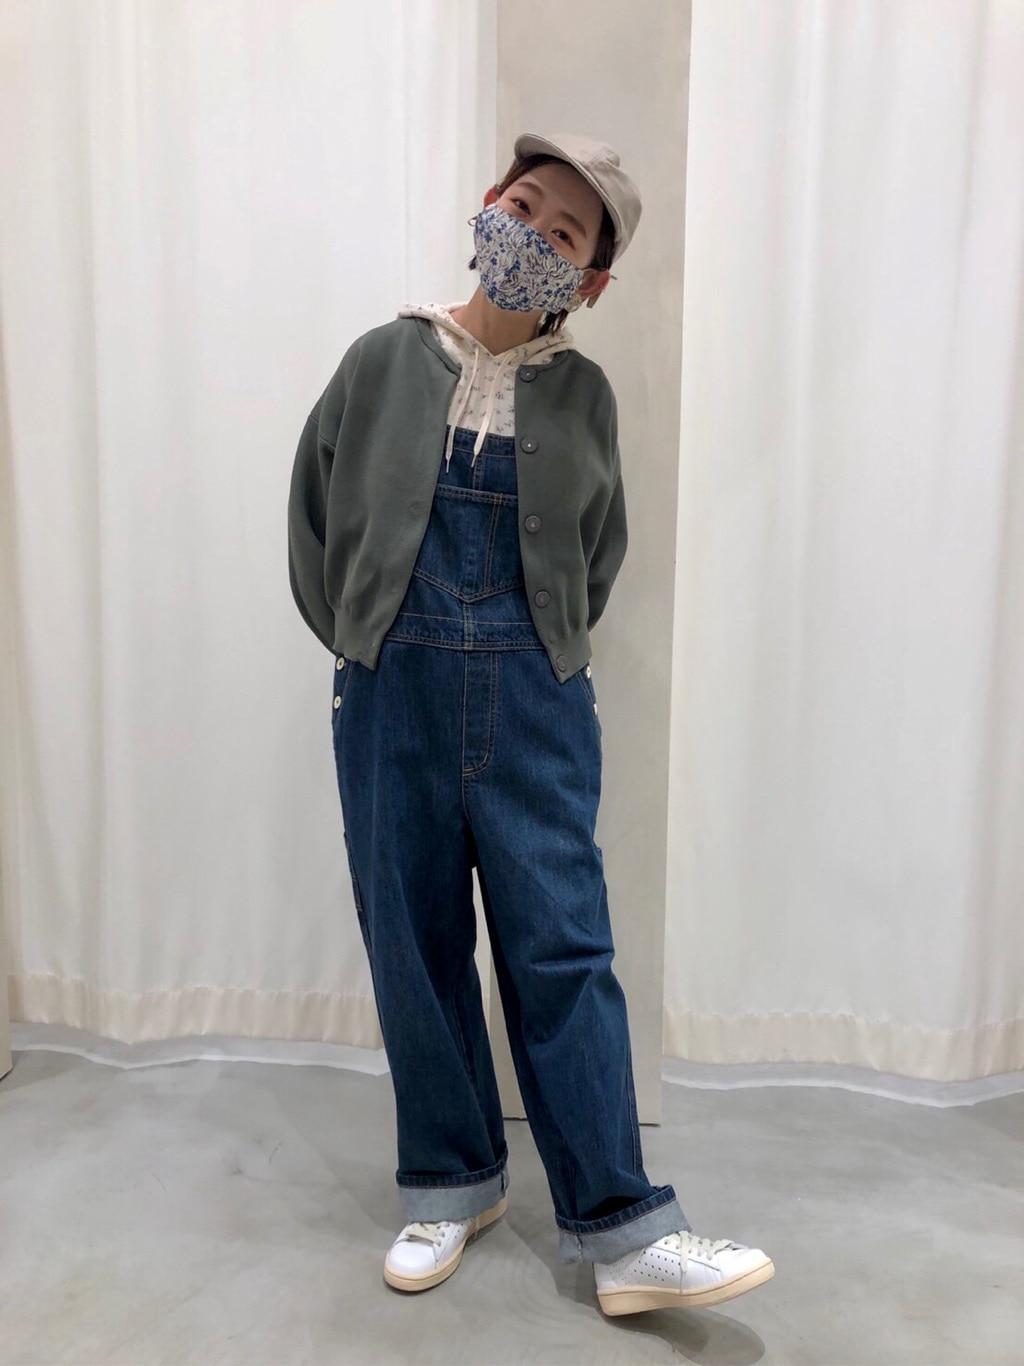 CHILD WOMAN , PAR ICI 東京スカイツリータウン・ソラマチ 2020.09.24